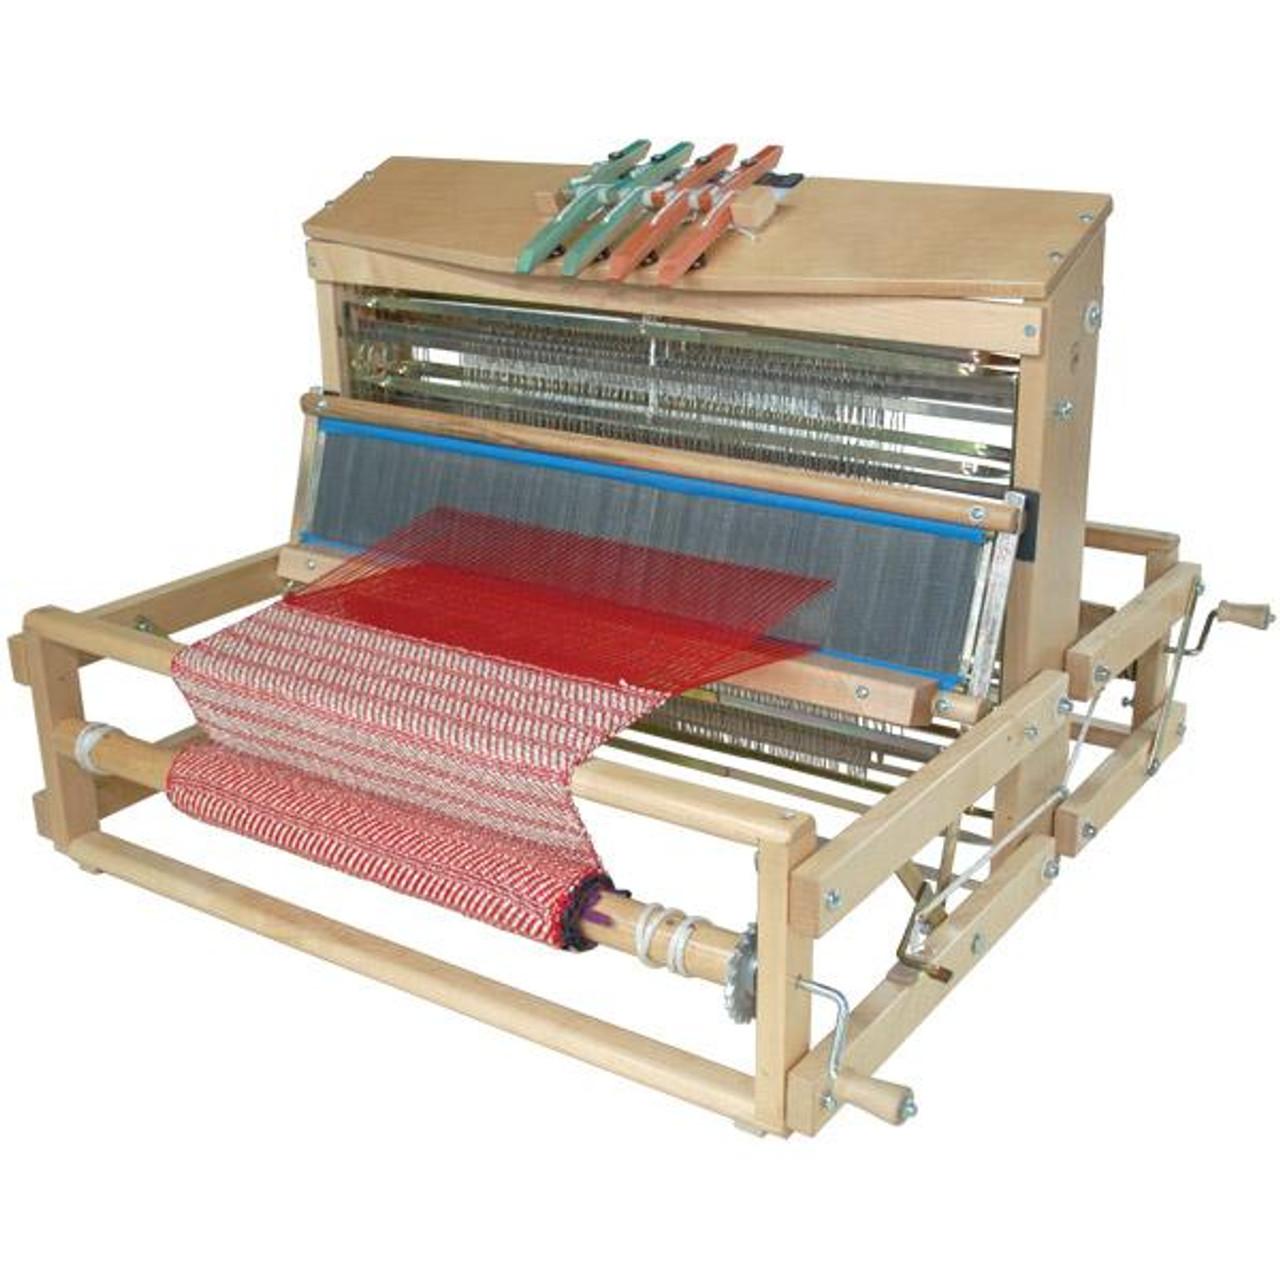 Leclerc Voyageur Table Loom | The Woolery